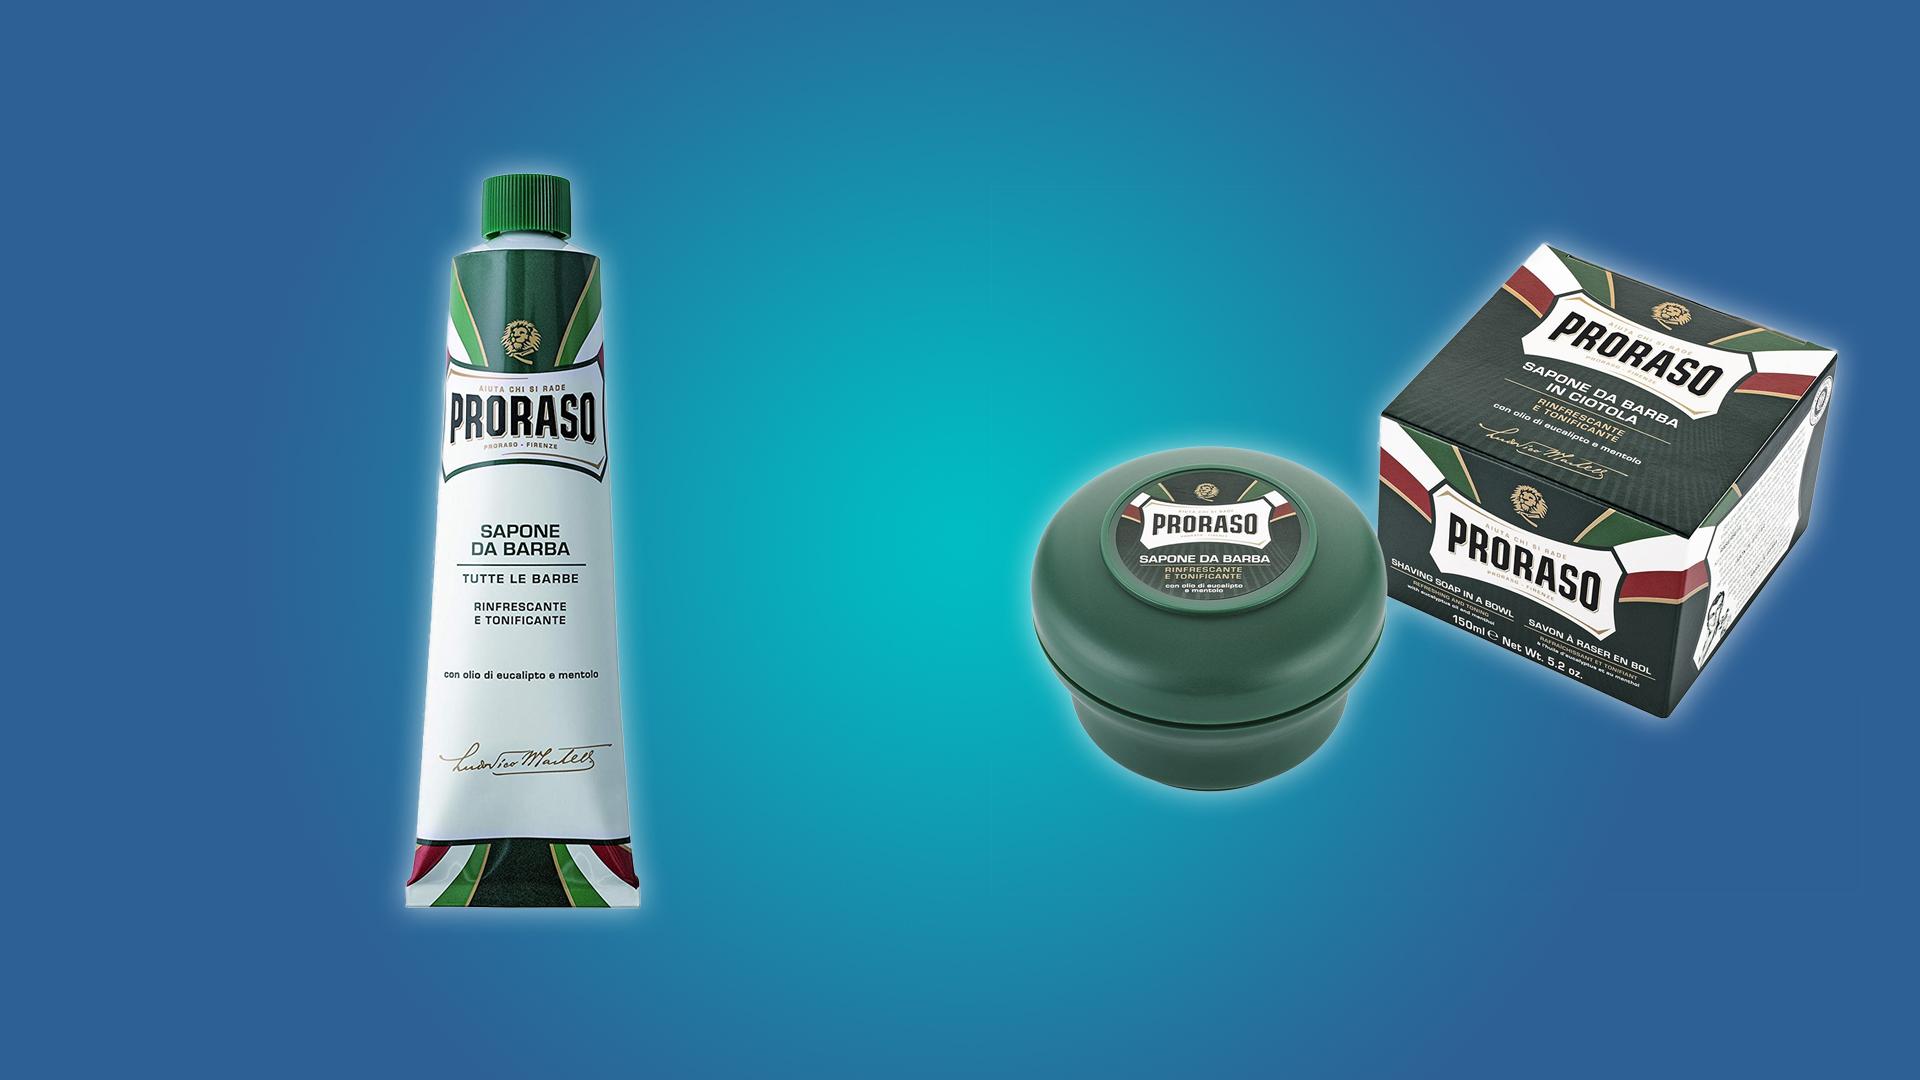 The Proraso shaving cream and shaving soap